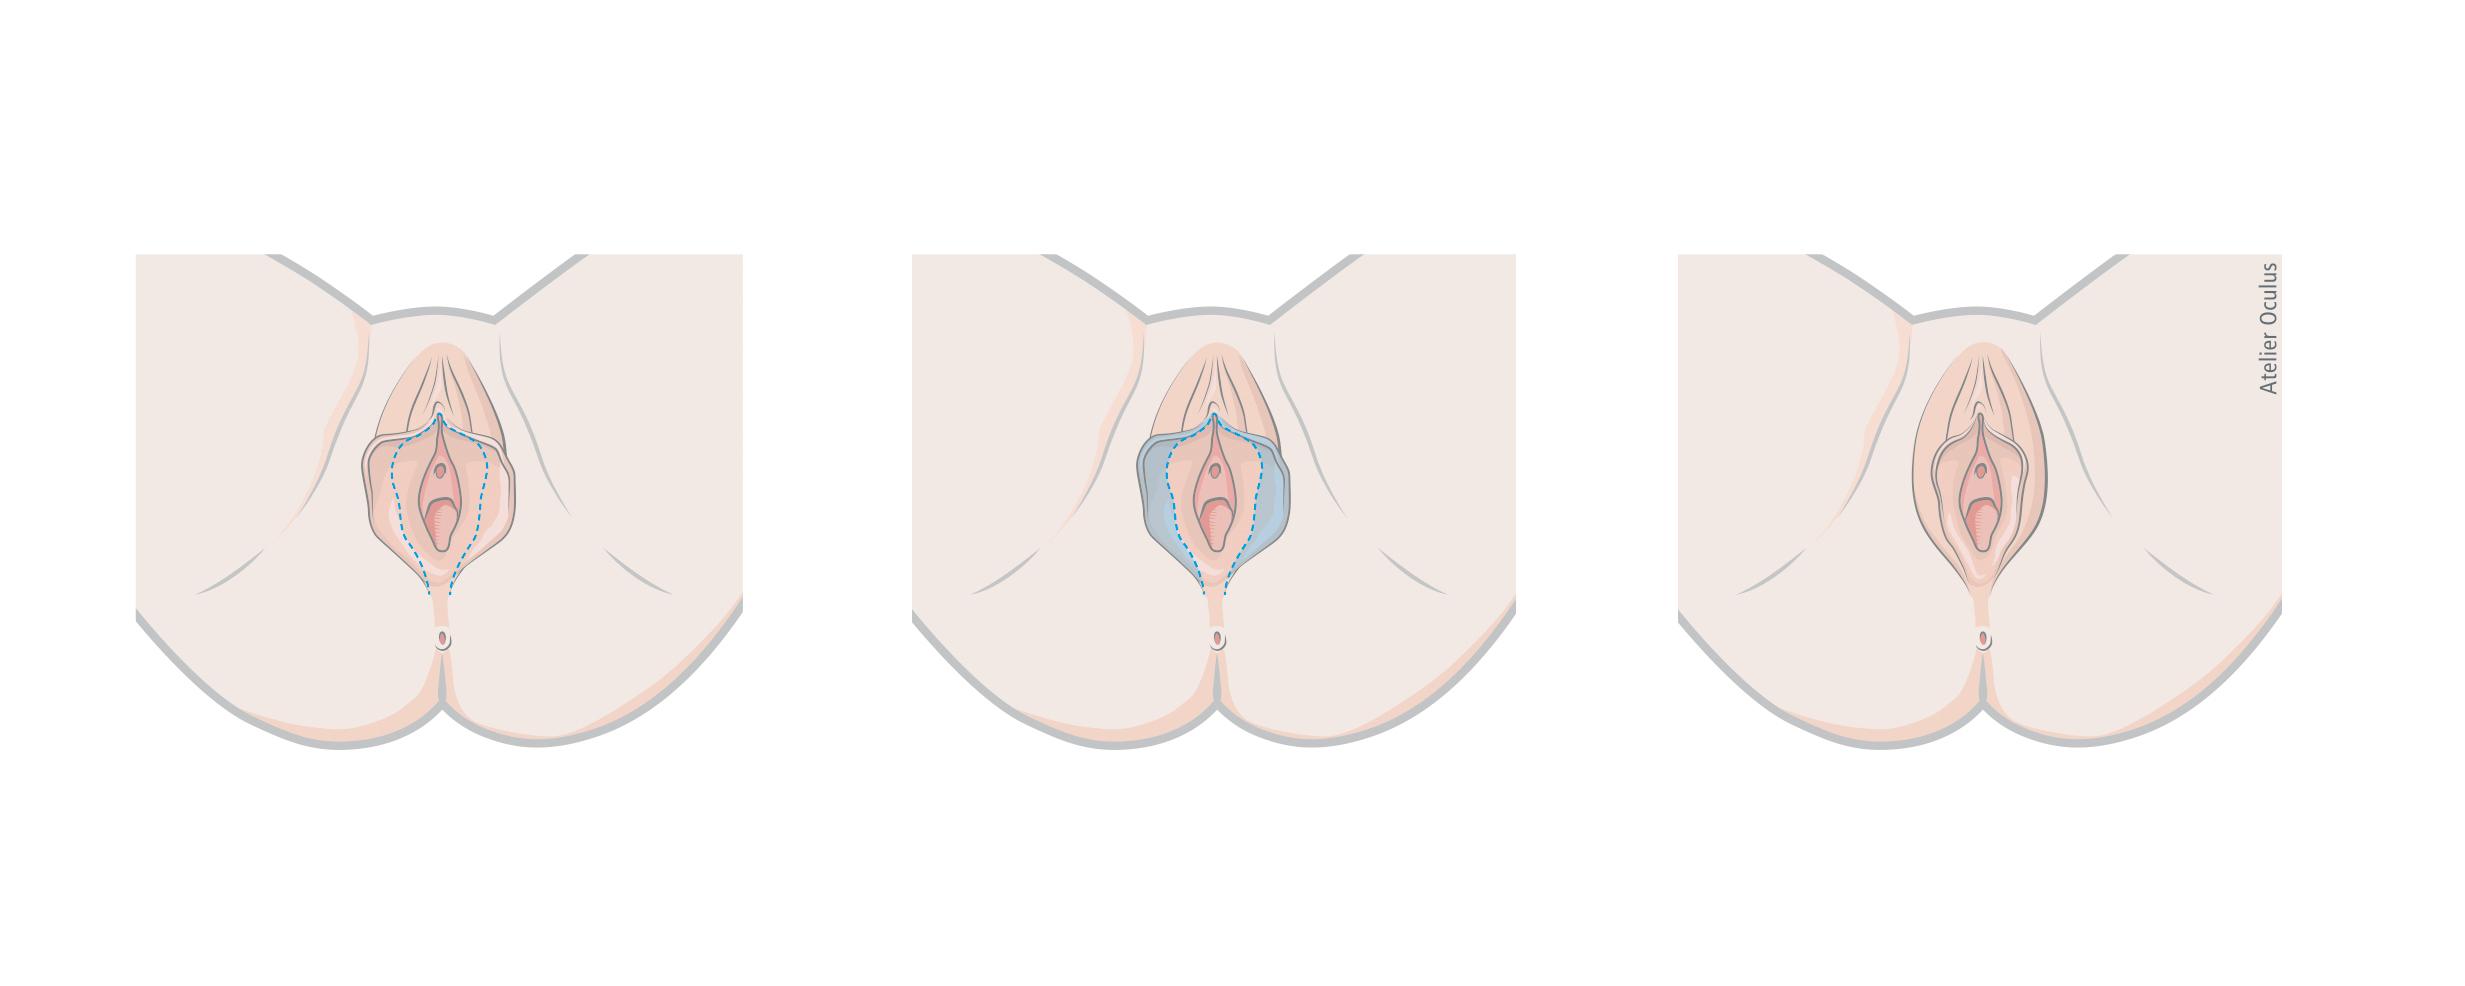 Schamlippe der inneren Inneren Schamlippen